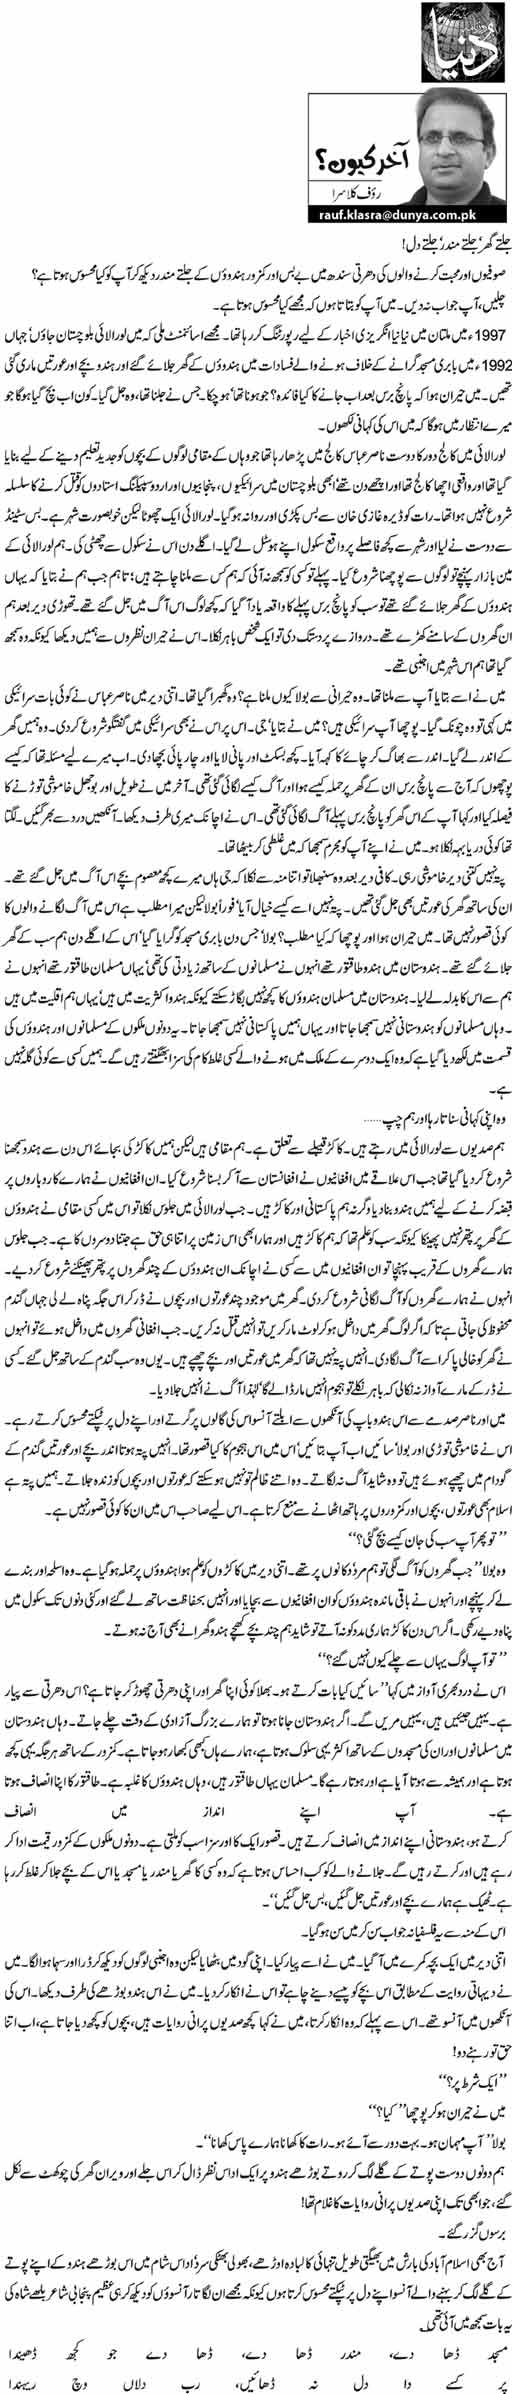 Jaltay Ghar, Jaltay Mandar, Jaltay Dil! - Rauf Klasra